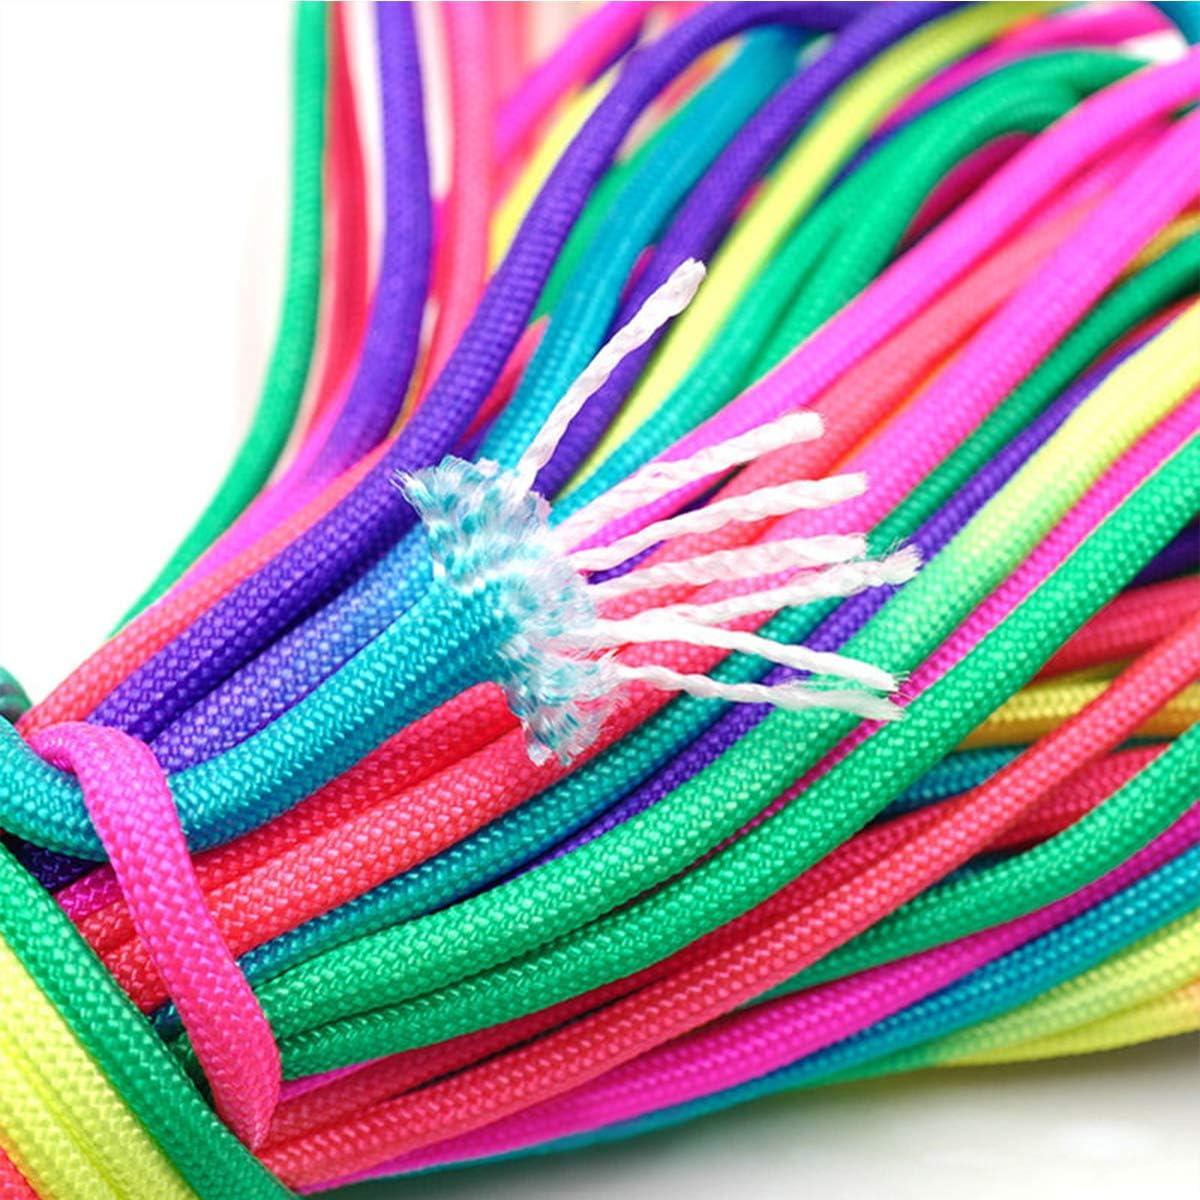 BOROLA 7 Strand Paracord Rope,Colorful Rainbow Cord,101 Feet